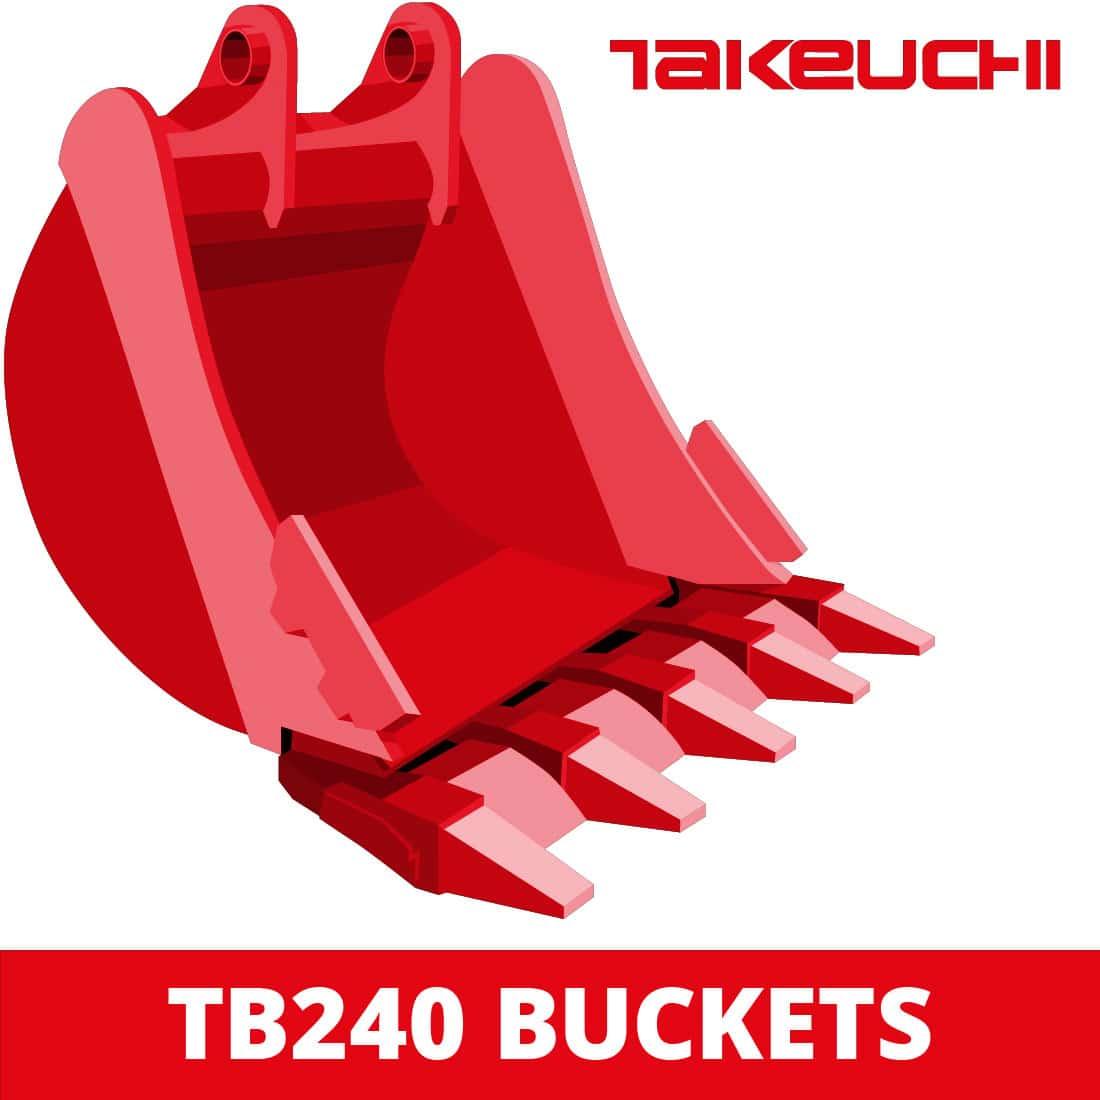 Takeuchi TB240 Digger Buckets